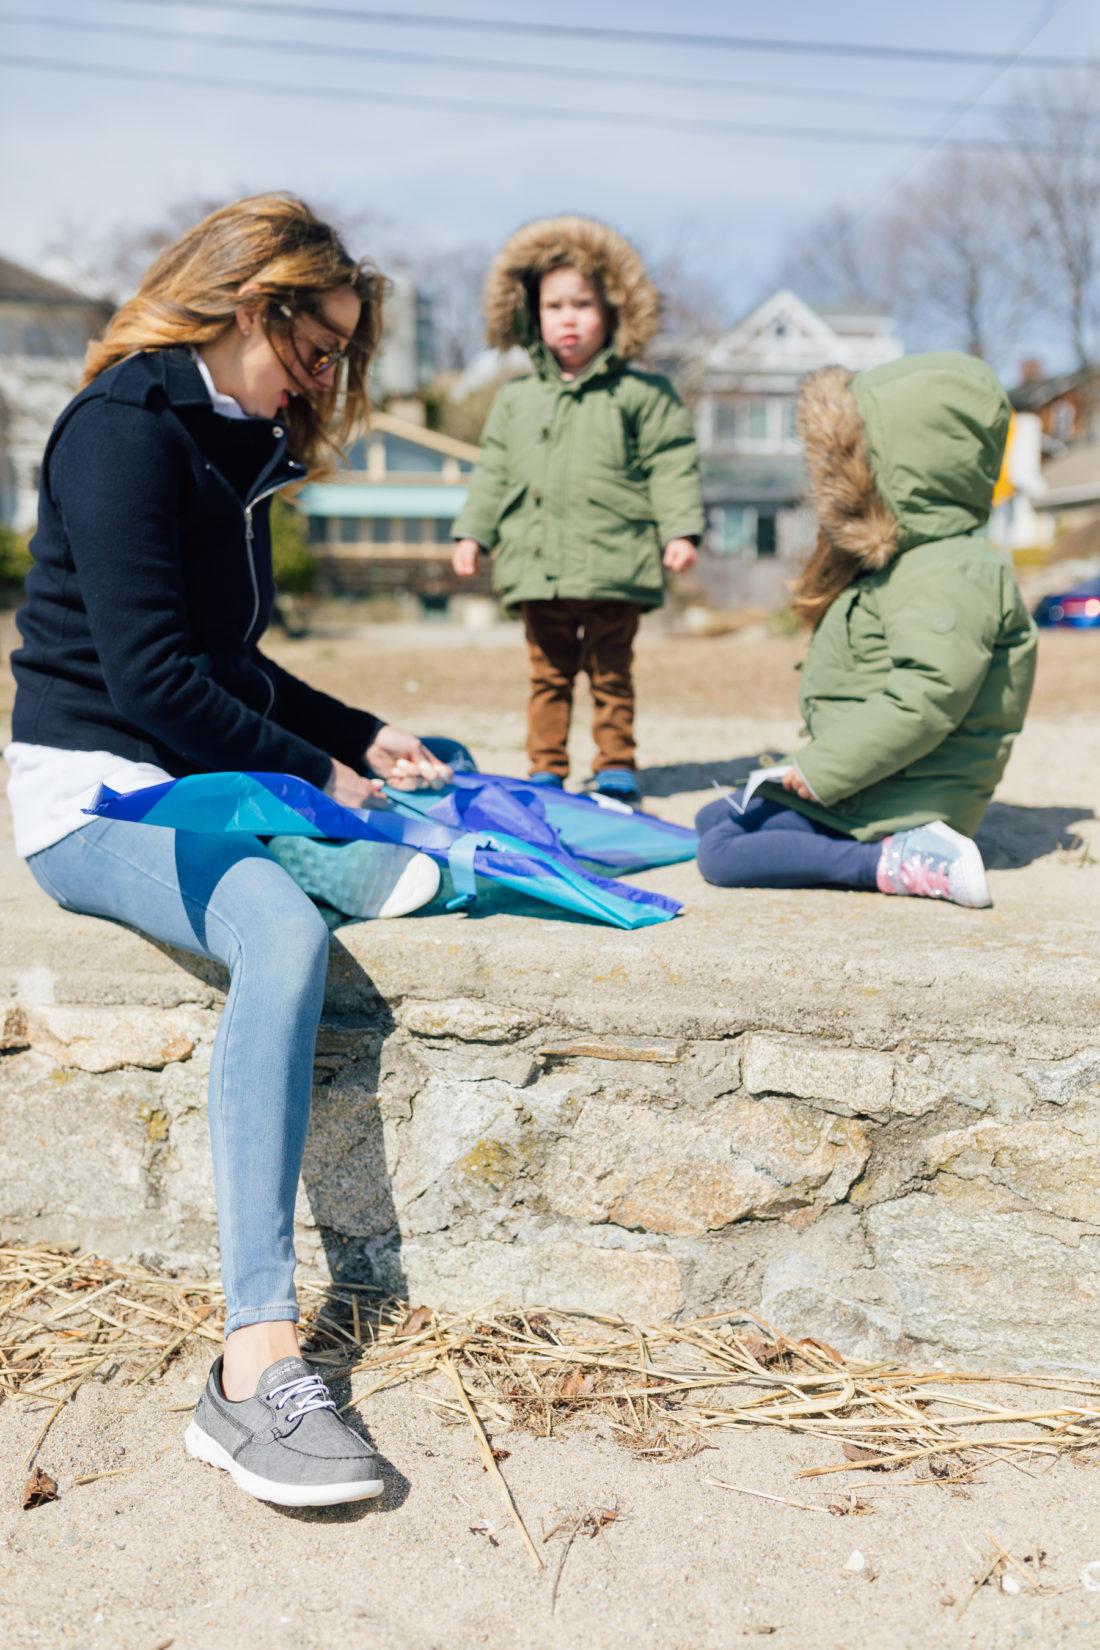 Eva Amurri Martino of Happily Eva After wears Sketchers GoWalk Lite Isla Boat Shoe with her kids Marlowe and Major on the beach